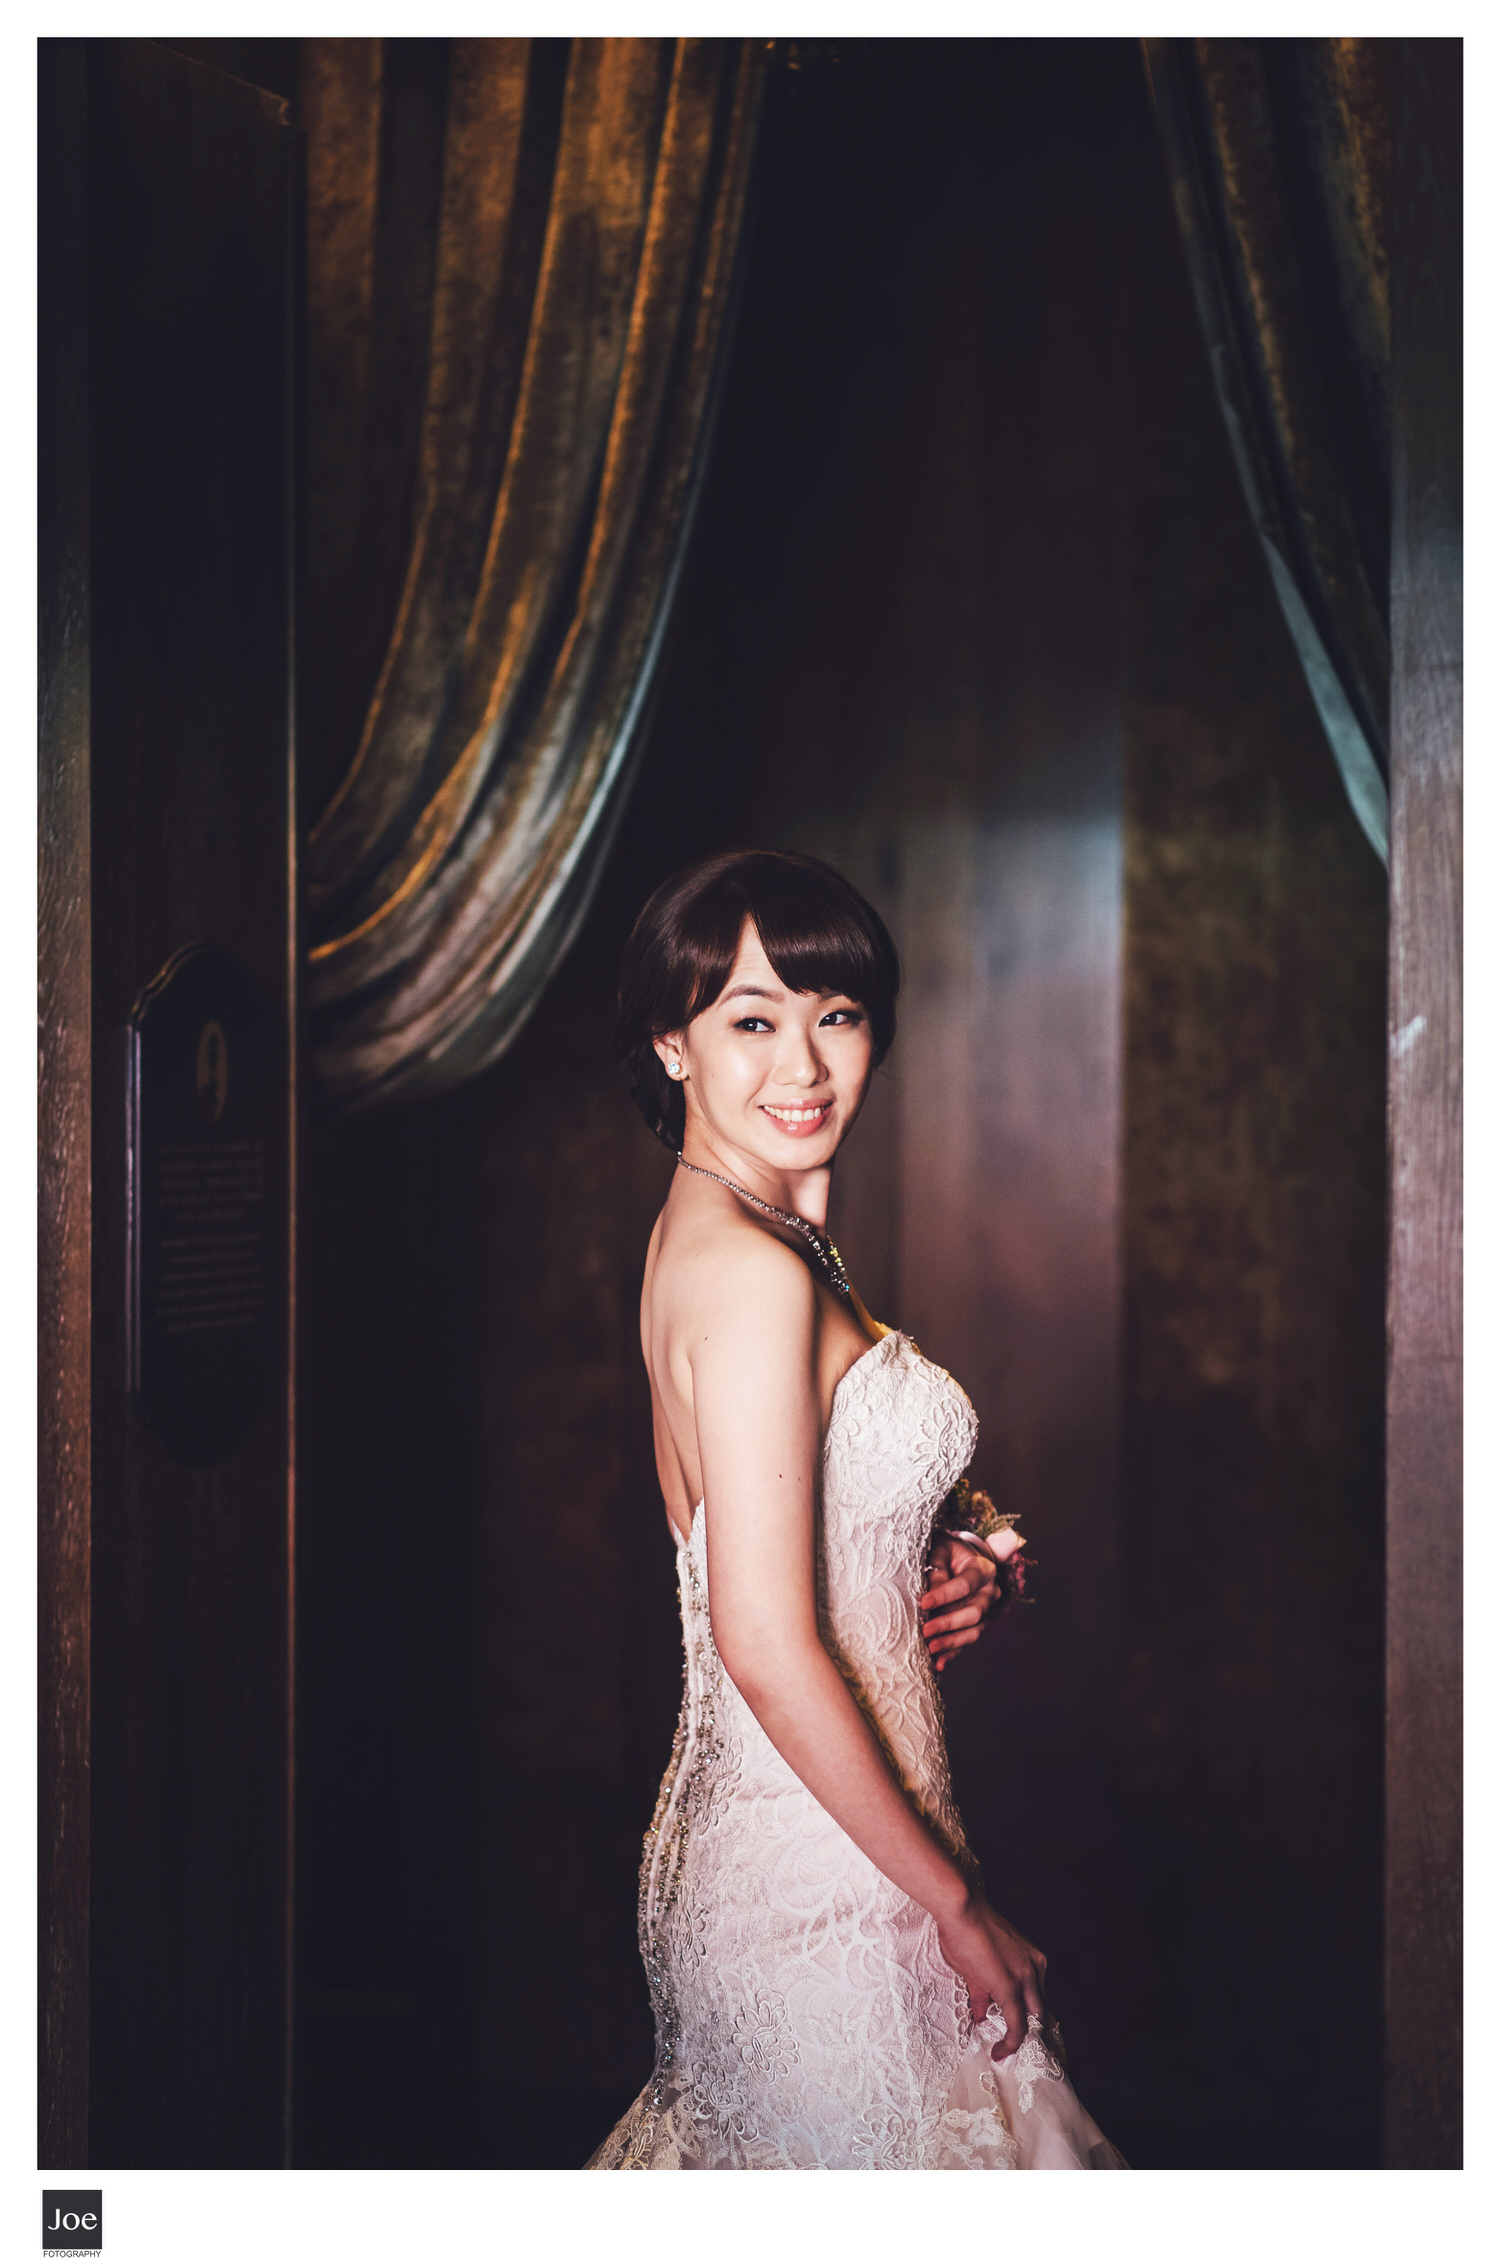 joe-fotography-wedding-palais-de-chine-hotel-11.jpg